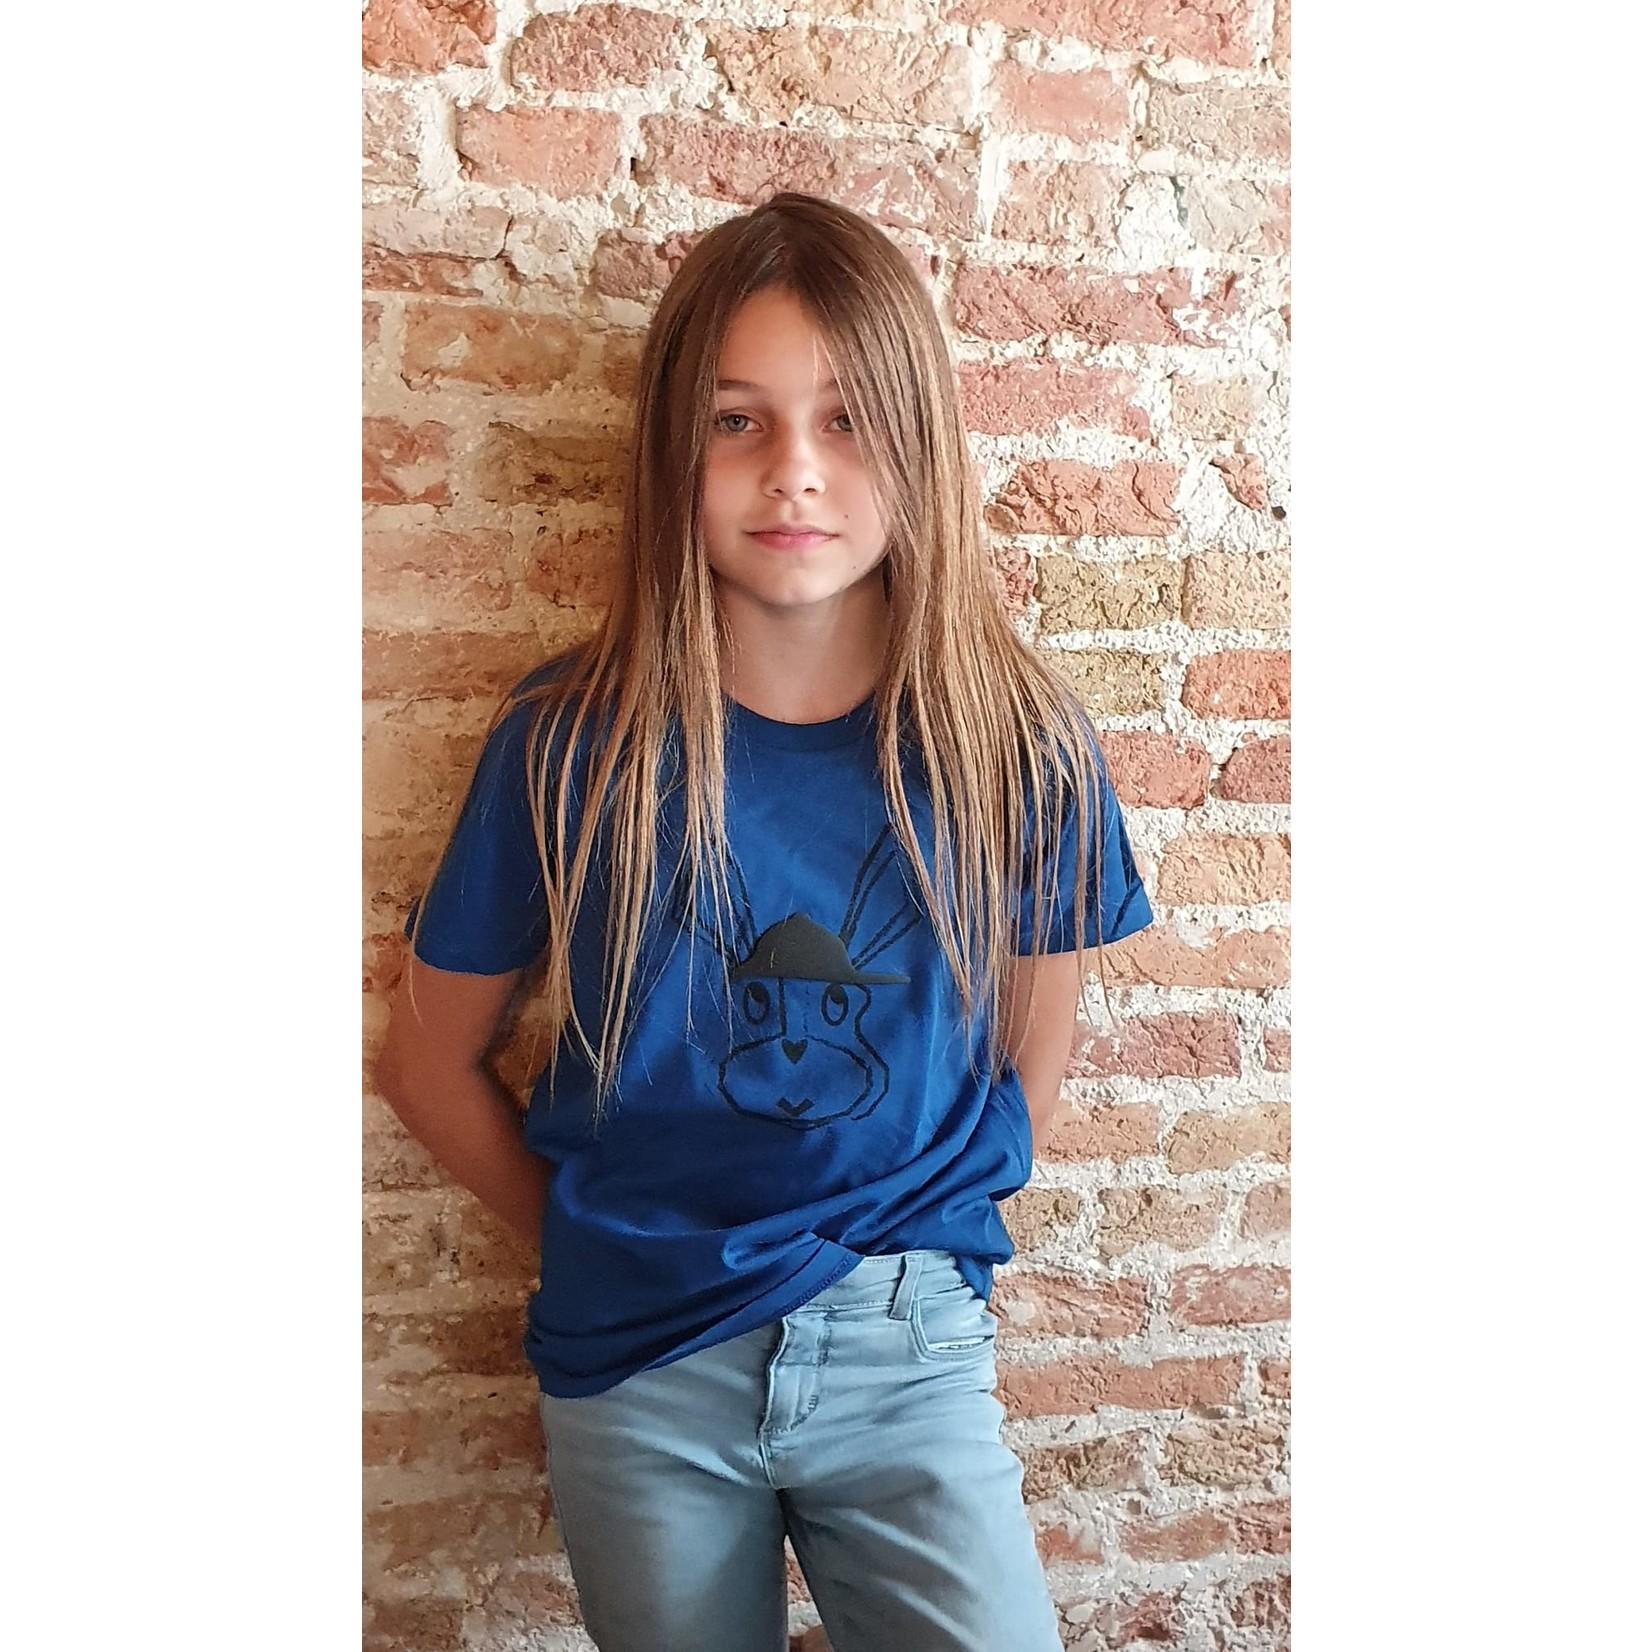 The Cool Rabbit Little Falcon t-shirt